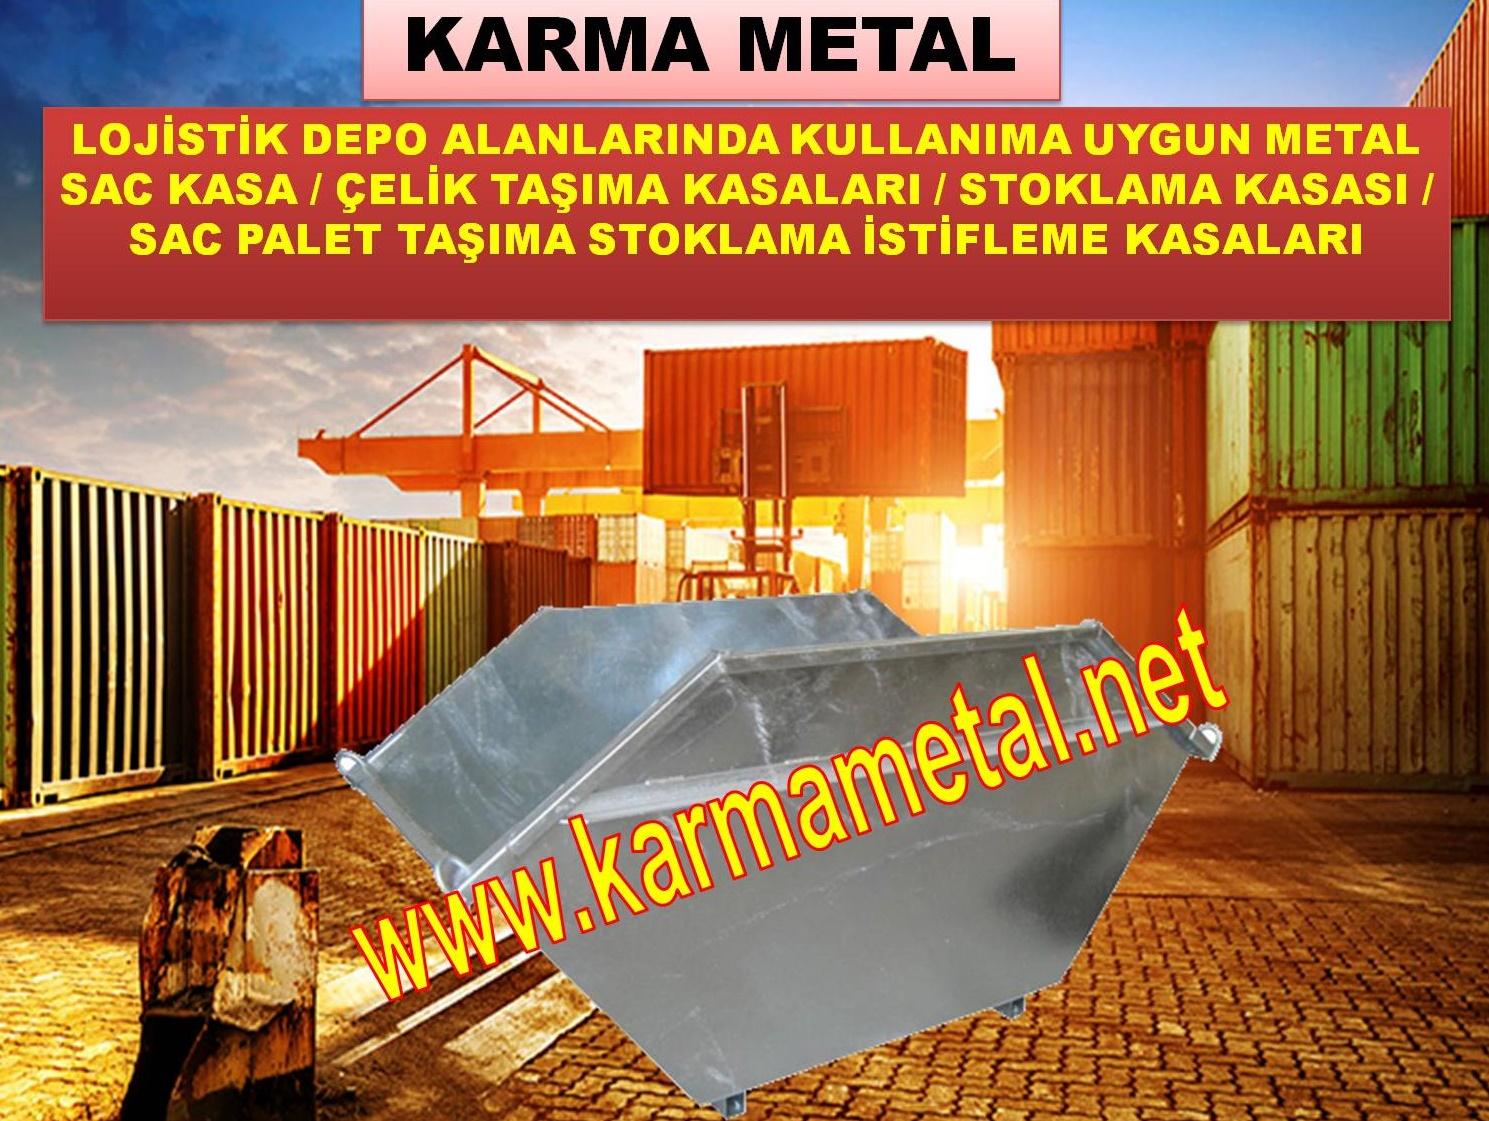 katlanabilir_katlanir__kasa__metal_celik_sac_tasima_stoklama_istifleme__kasasi_kasalari_sandiklari (3)